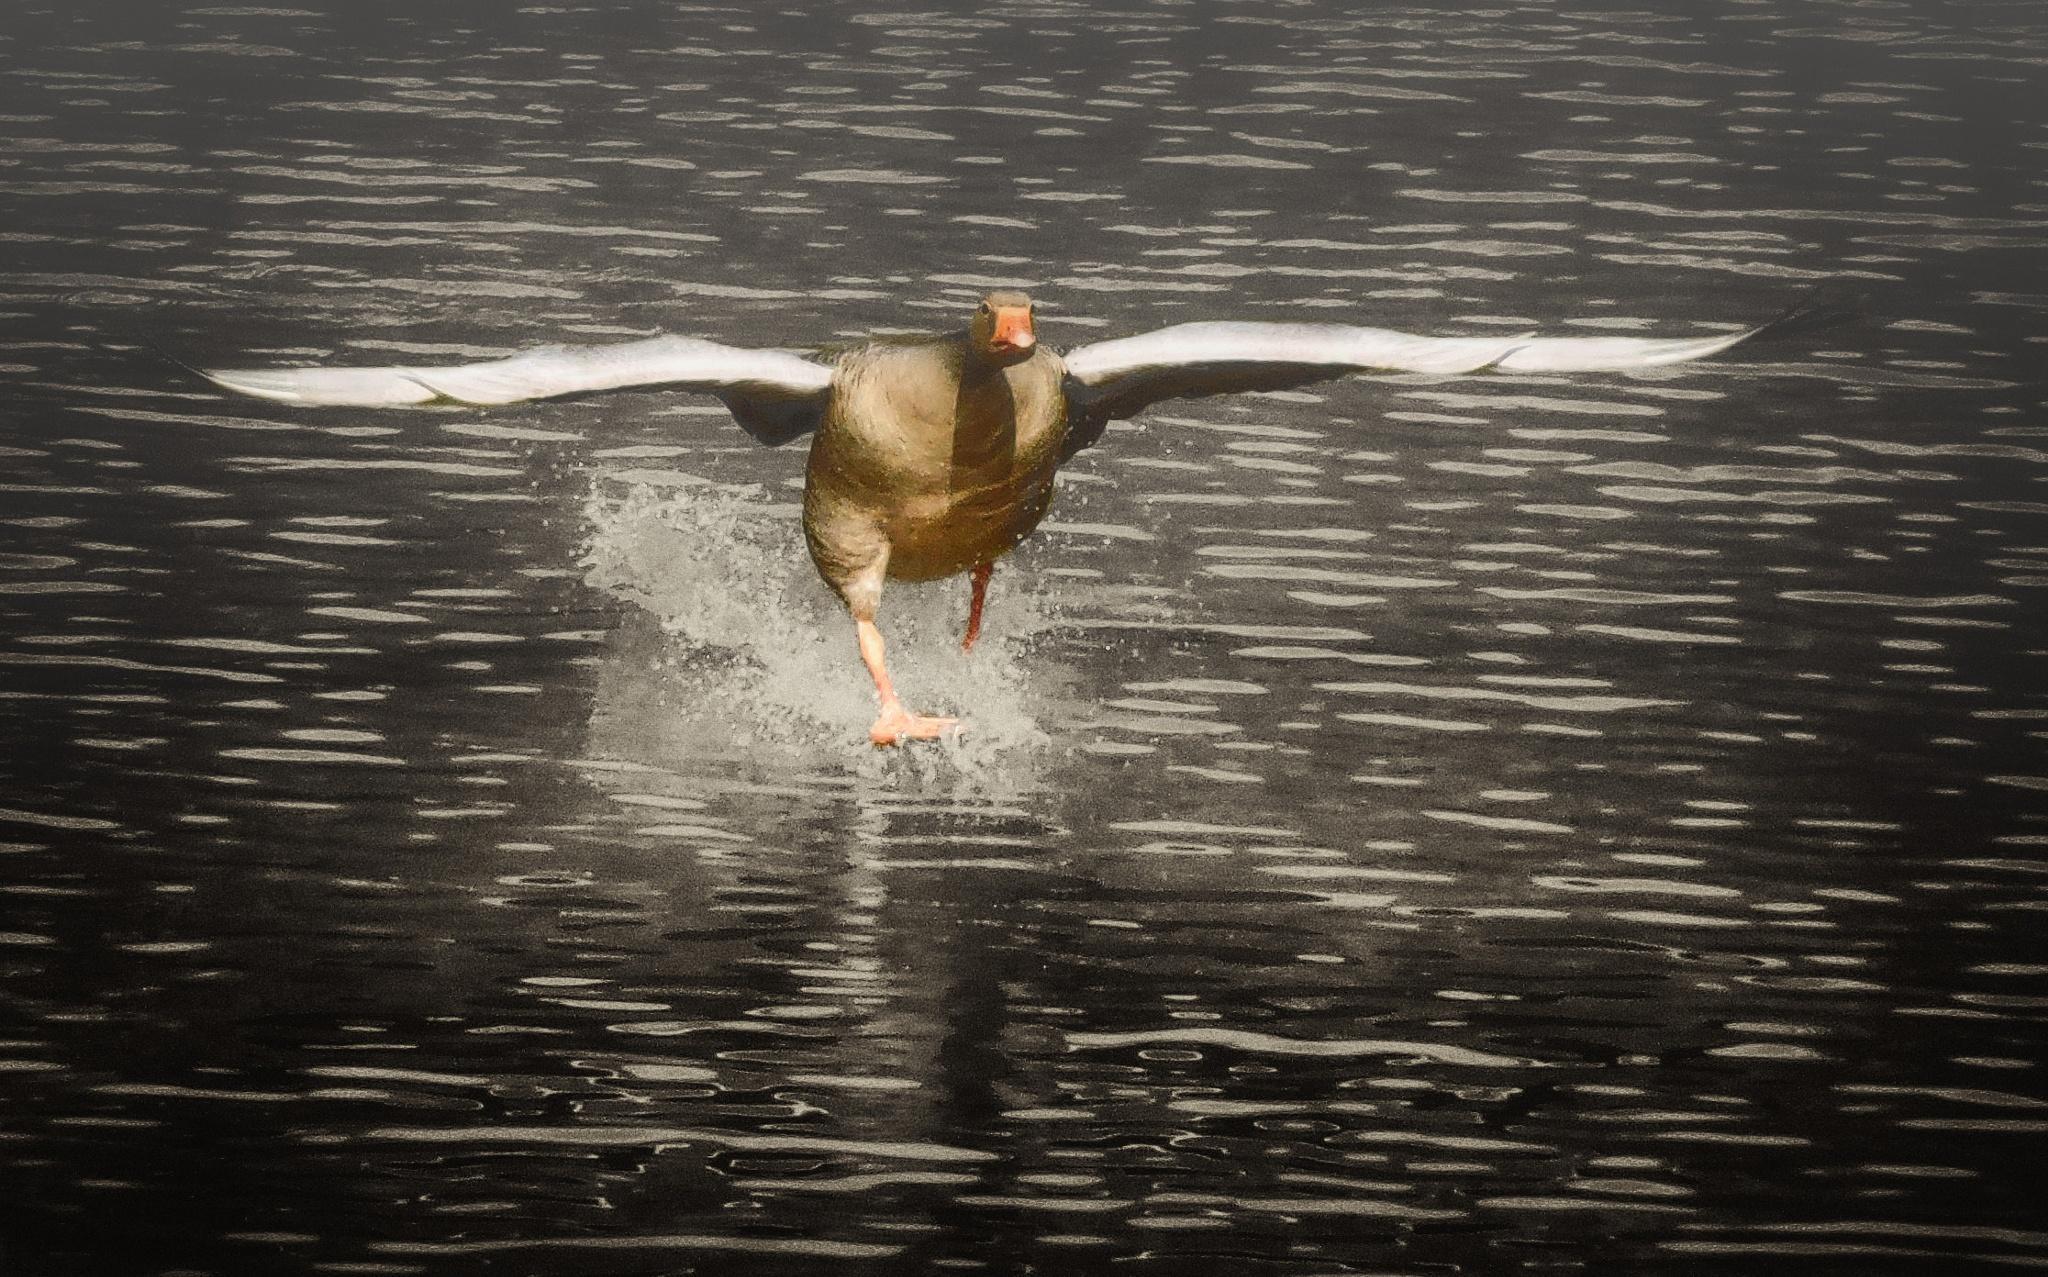 Soft landing by FranklinB